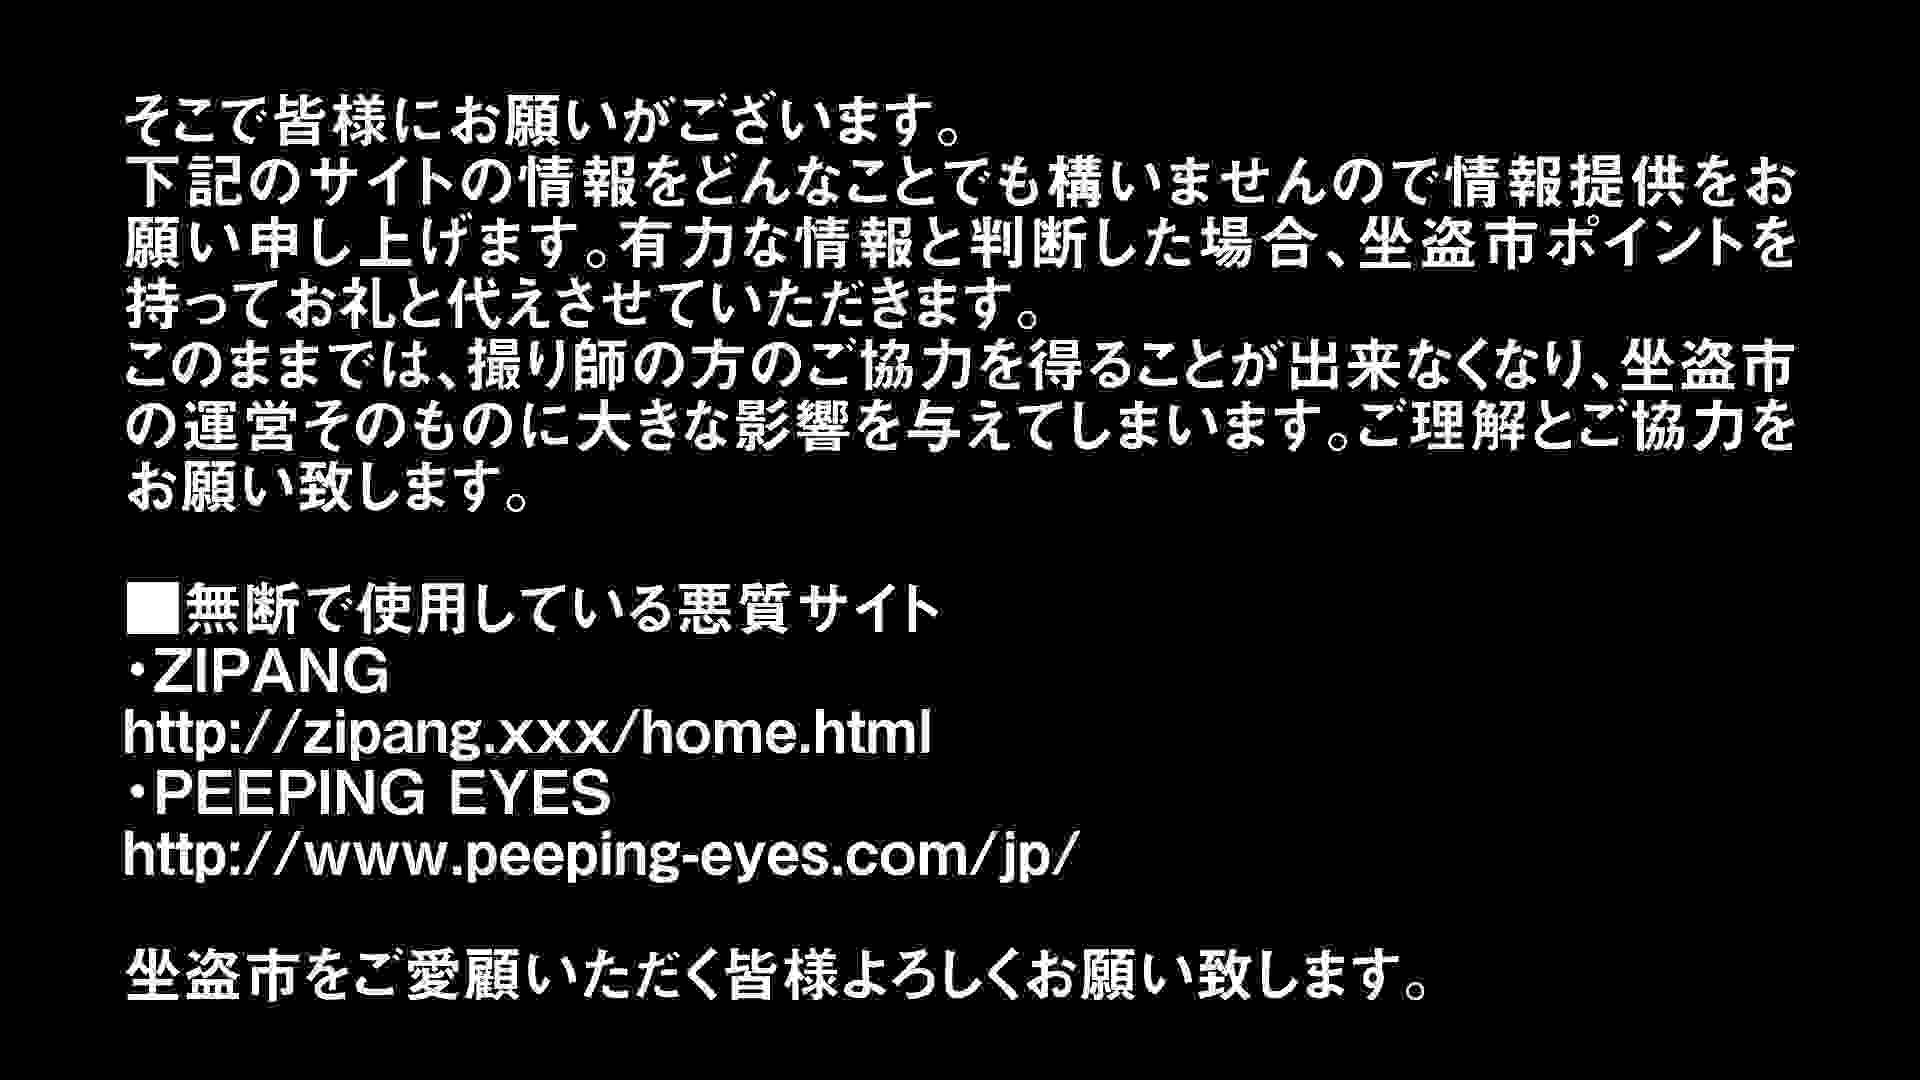 Aquaな露天風呂Vol.296 盗撮シリーズ   露天風呂編  102PIX 37